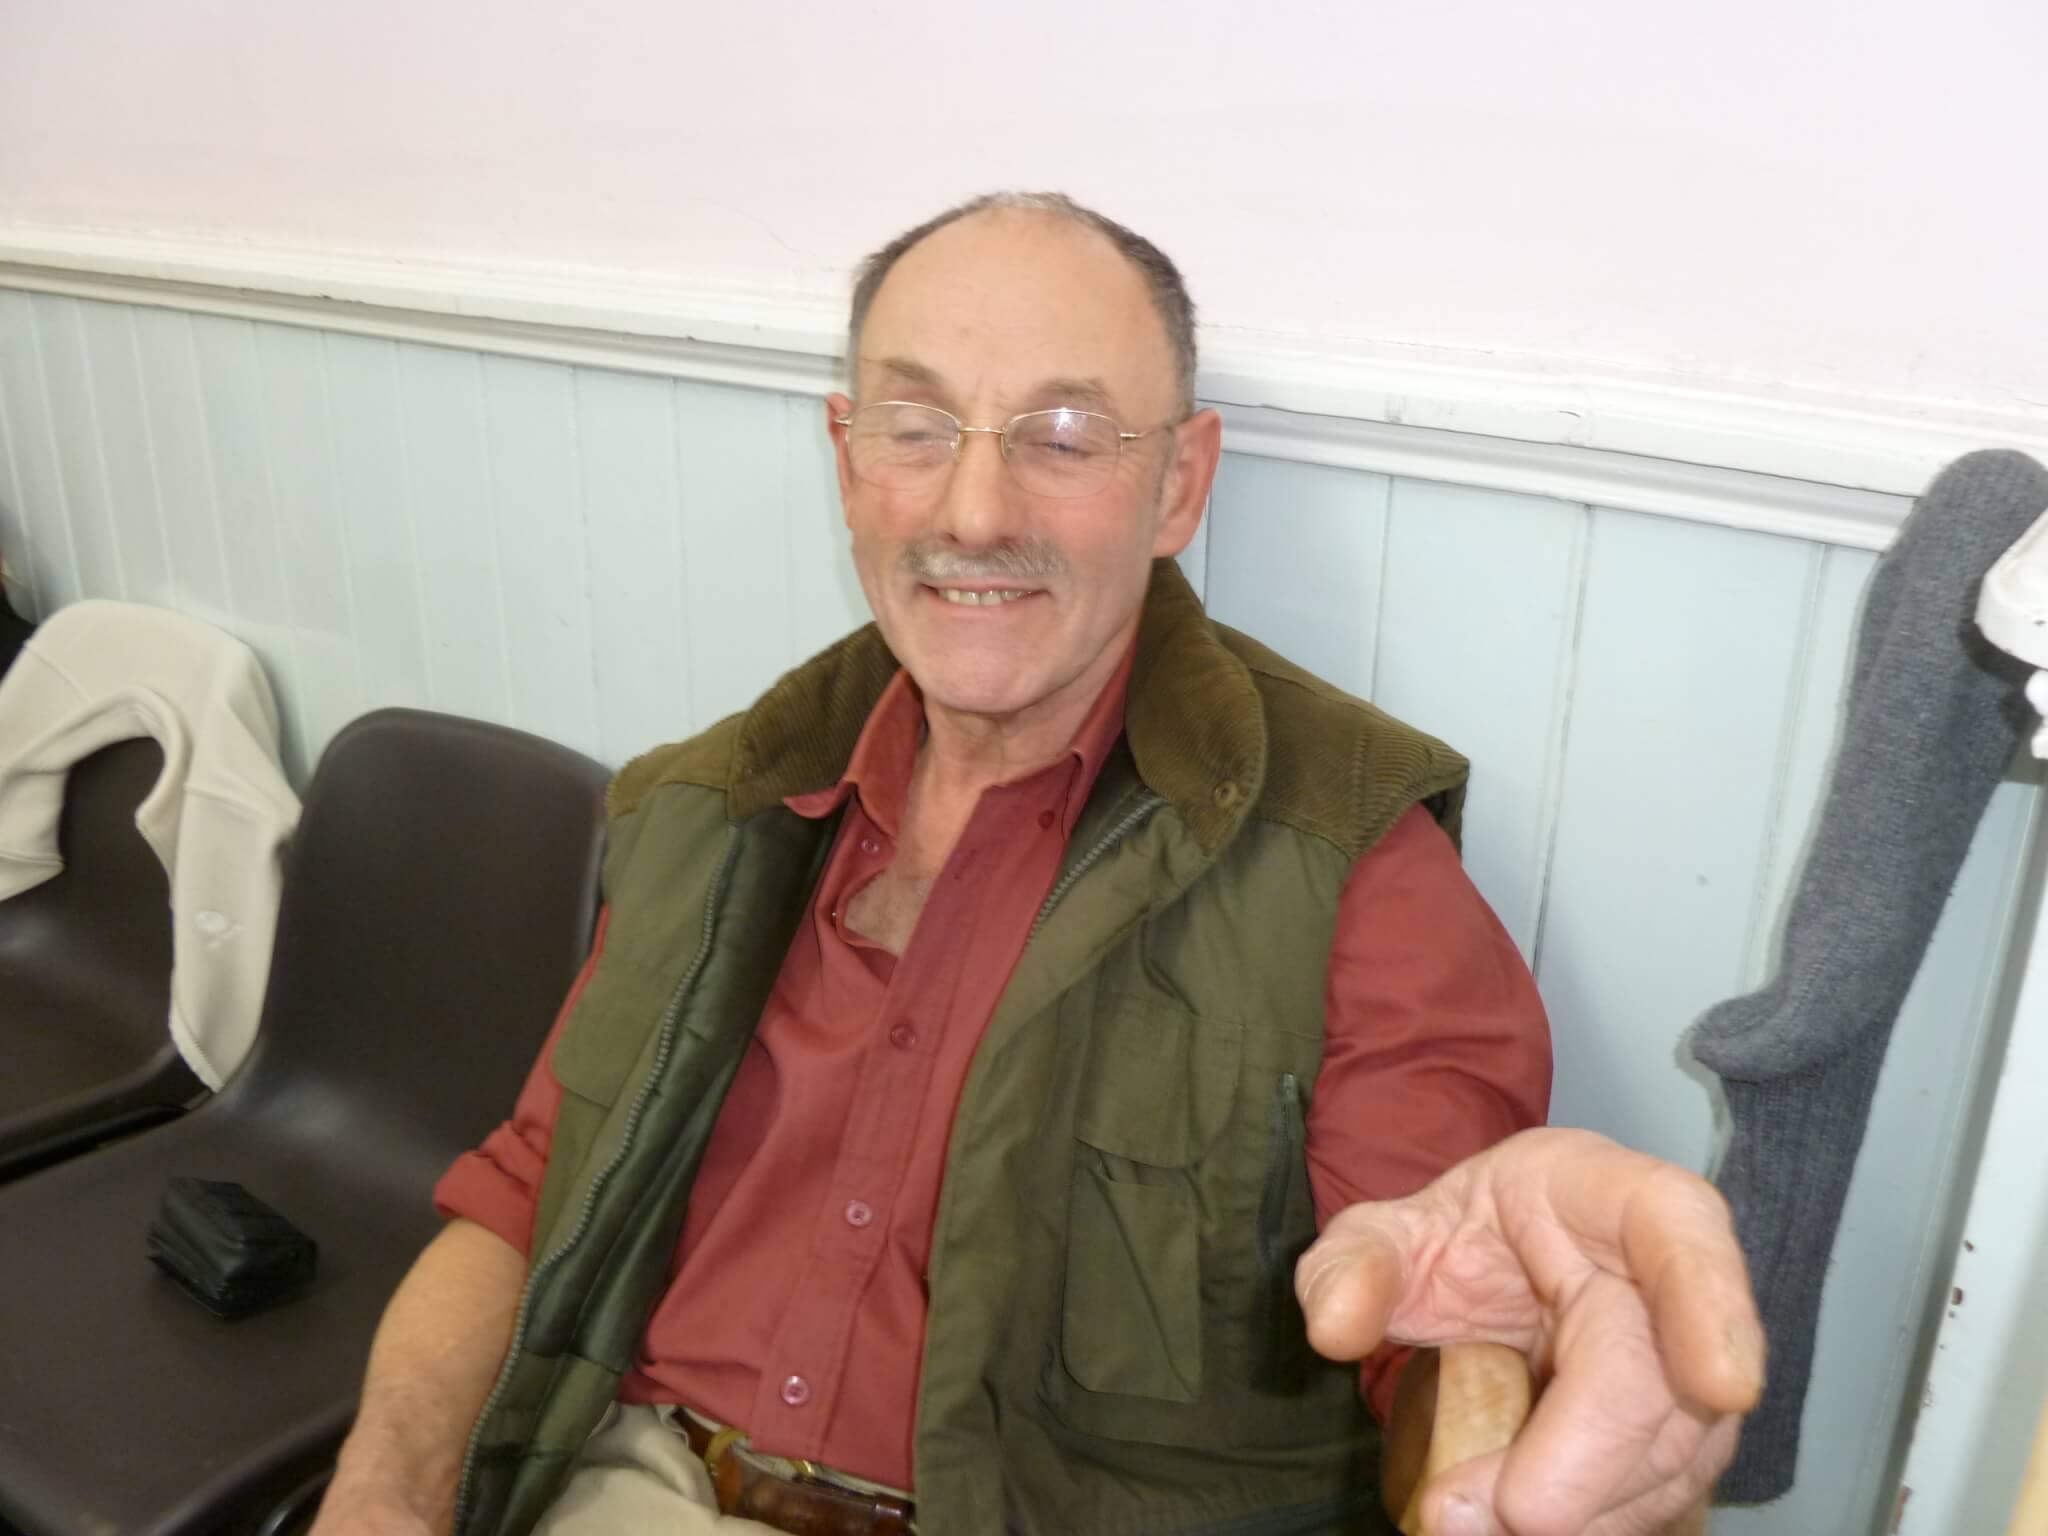 Clive Collins